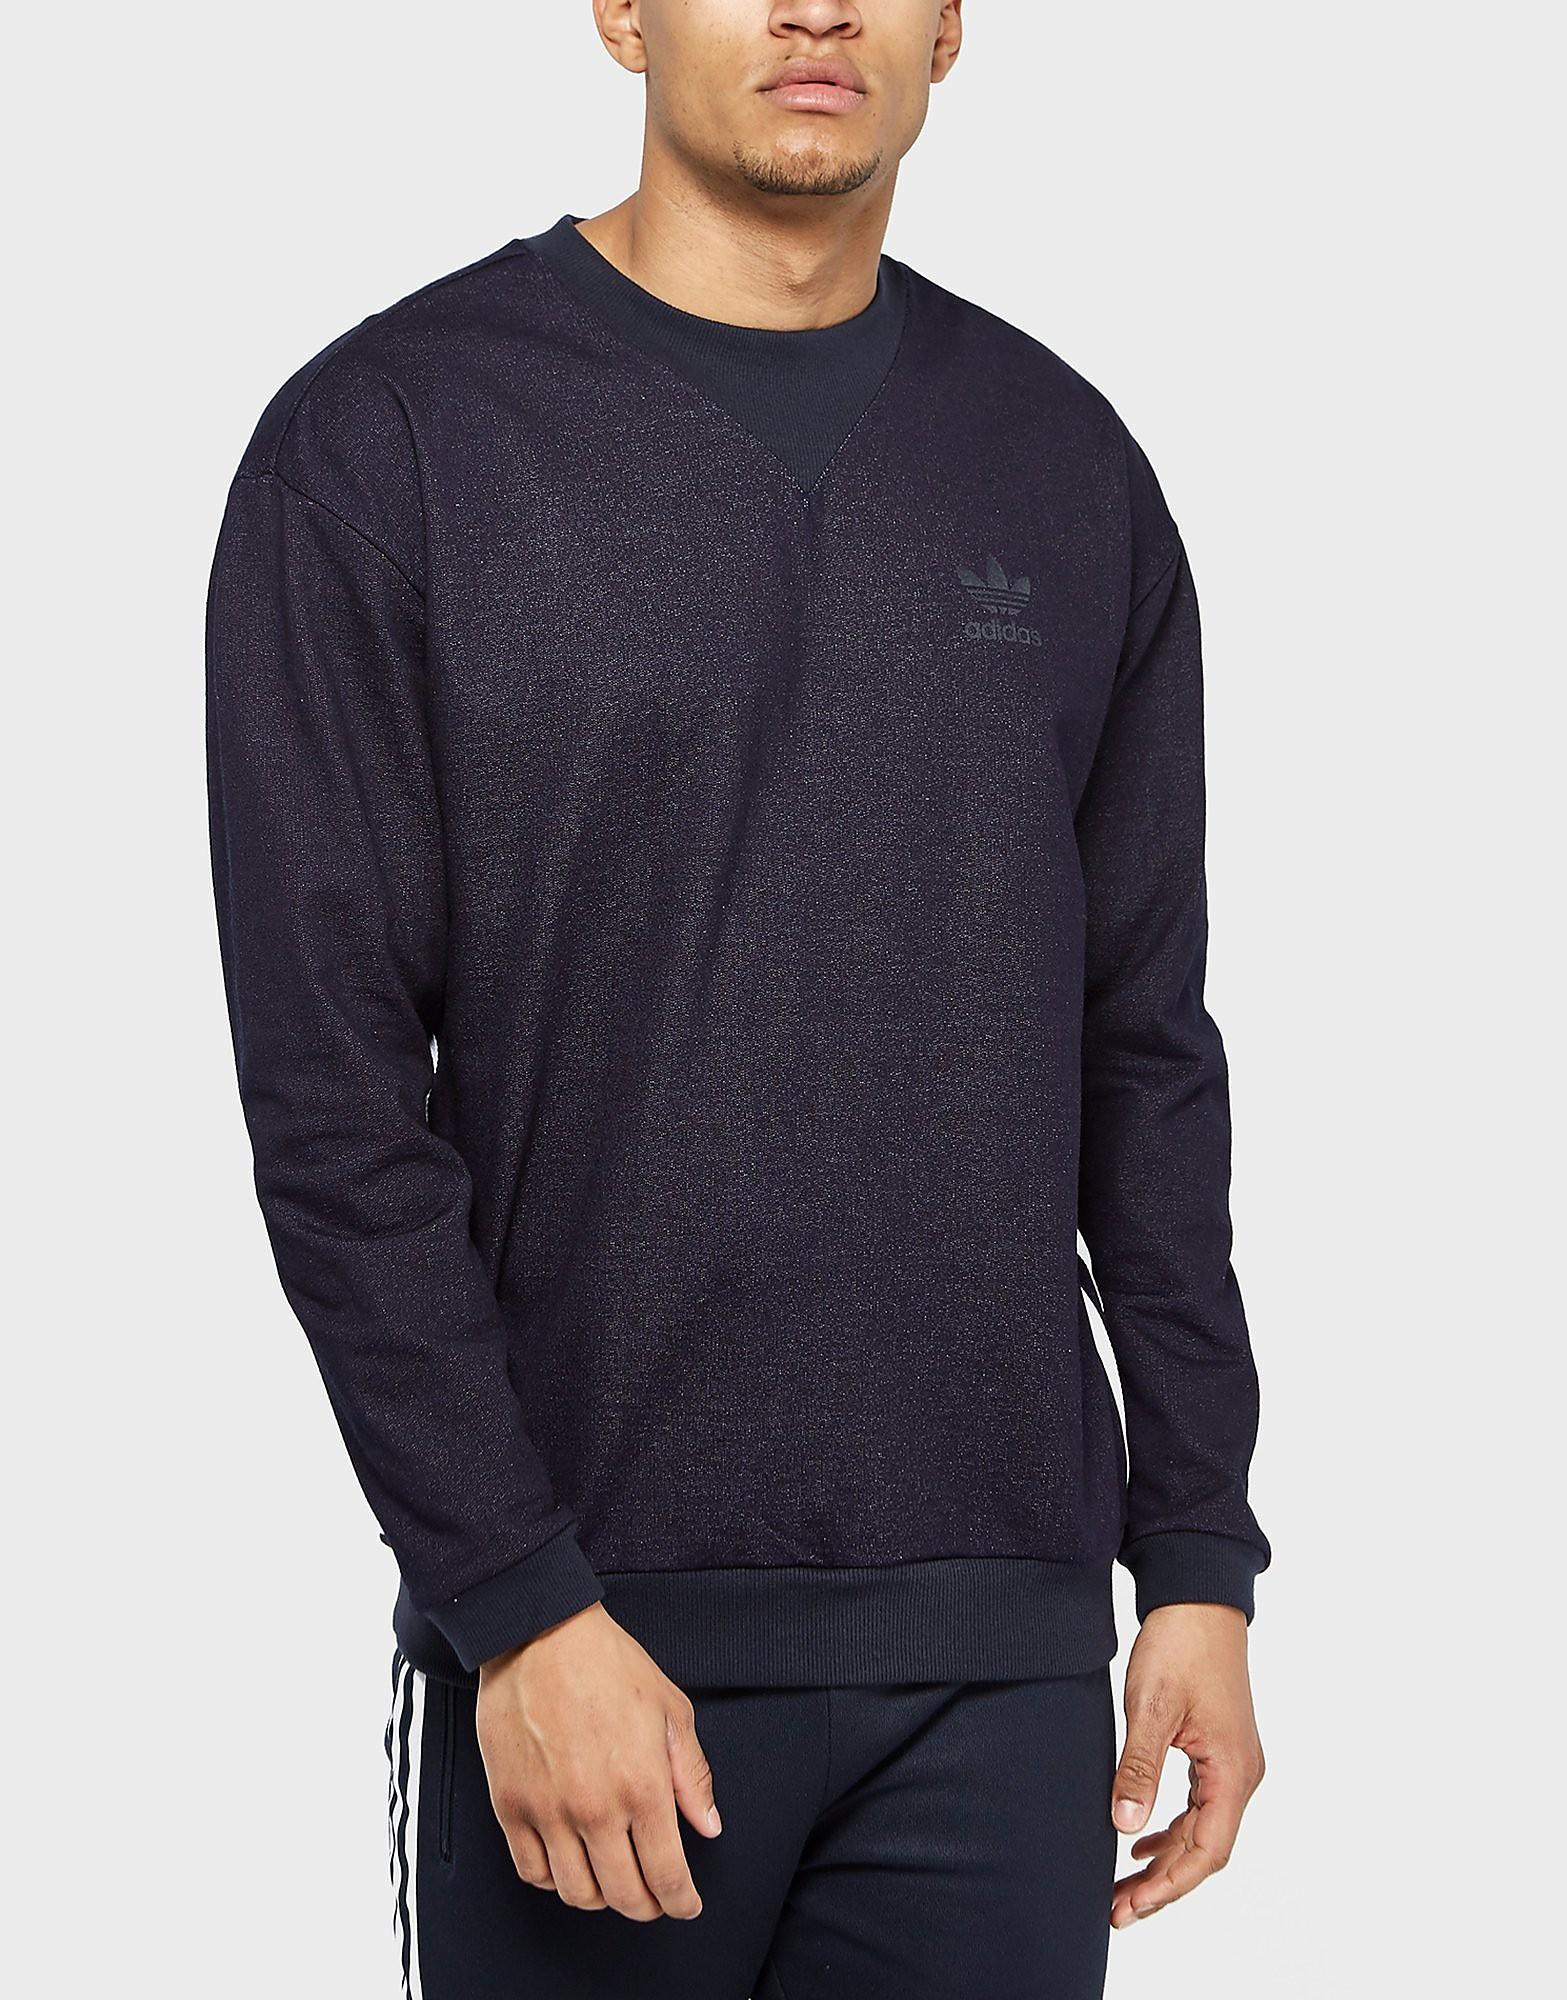 adidas Originals Tokyo Crew Sweatshirt